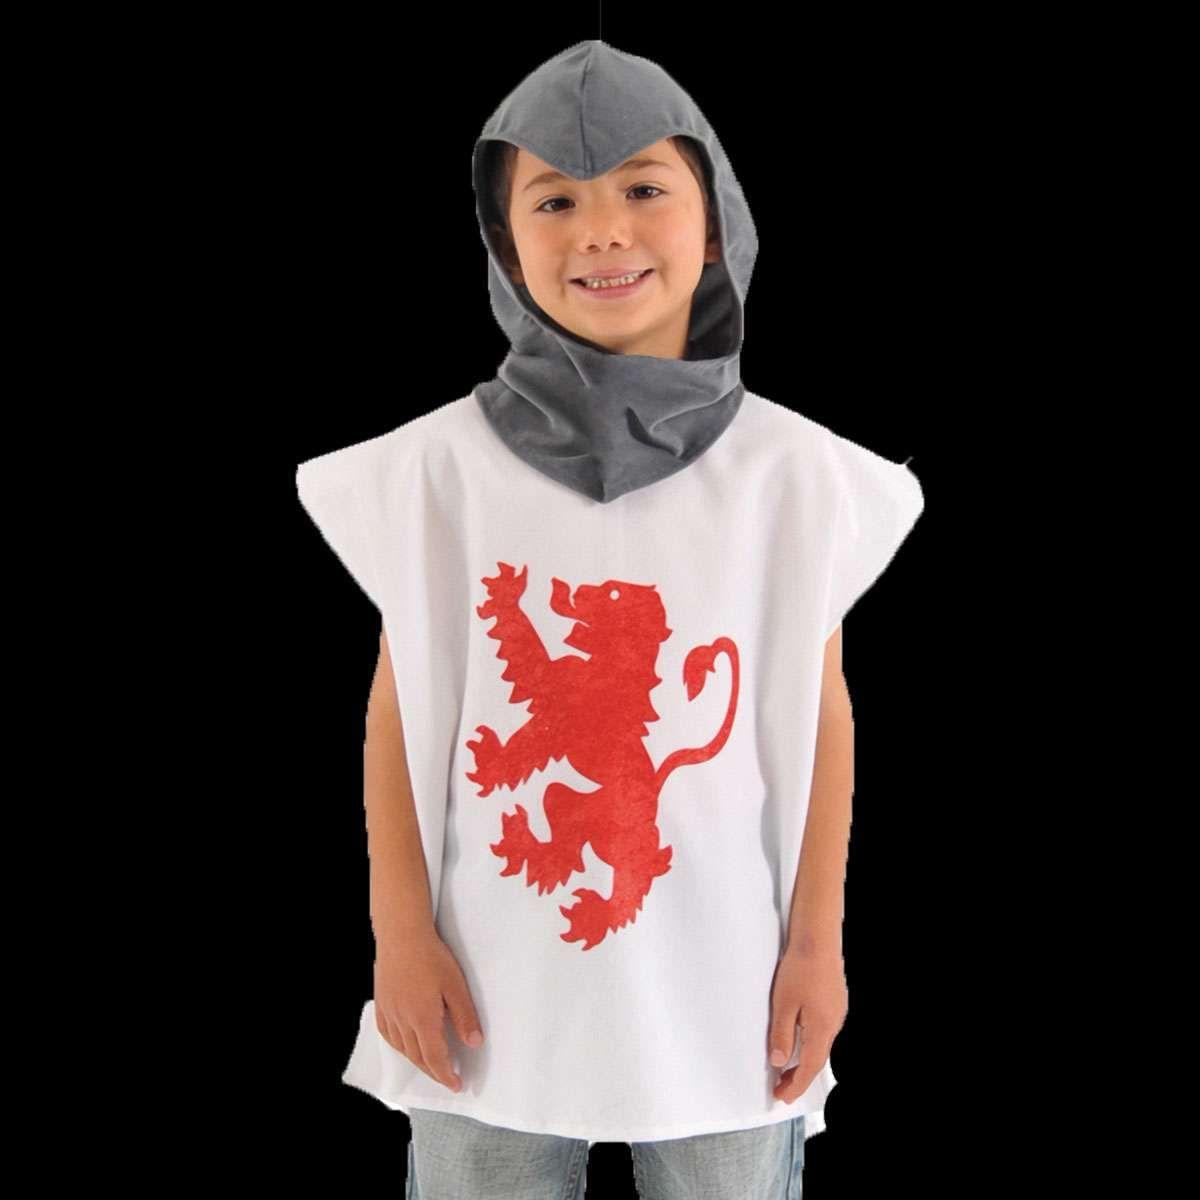 Kids Knight Tabard costume | costumes | Pinterest | Knight, Costumes ...